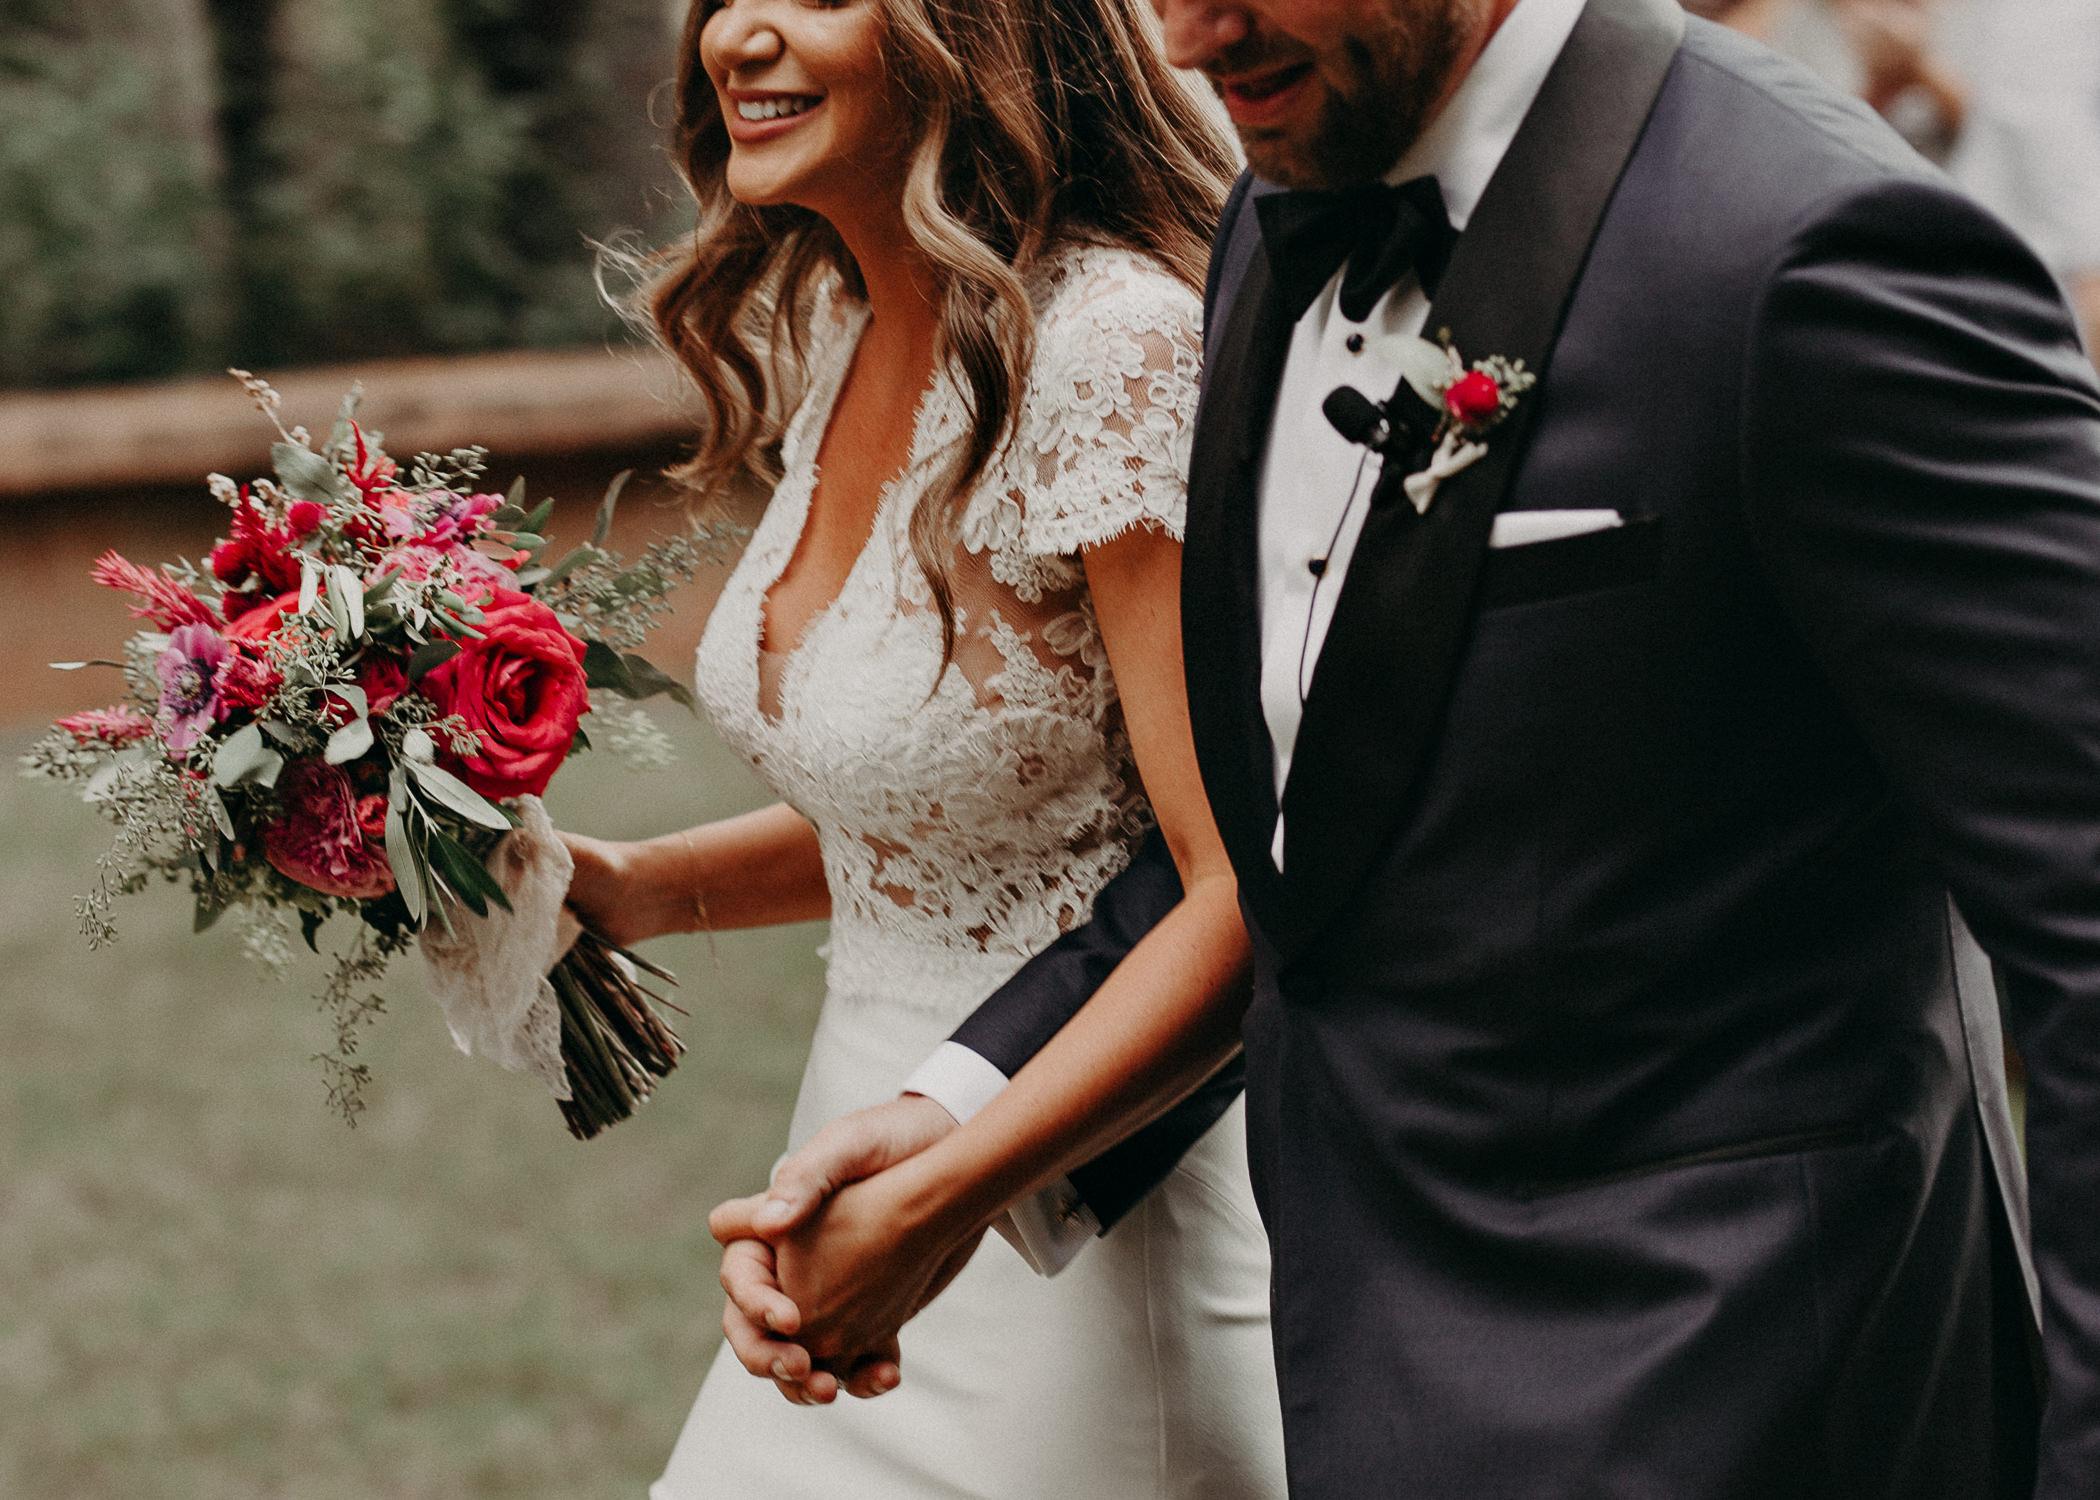 72 - walking down the aisle as husband and wife wedding ceremony at serenbi farms atlanta .jpg